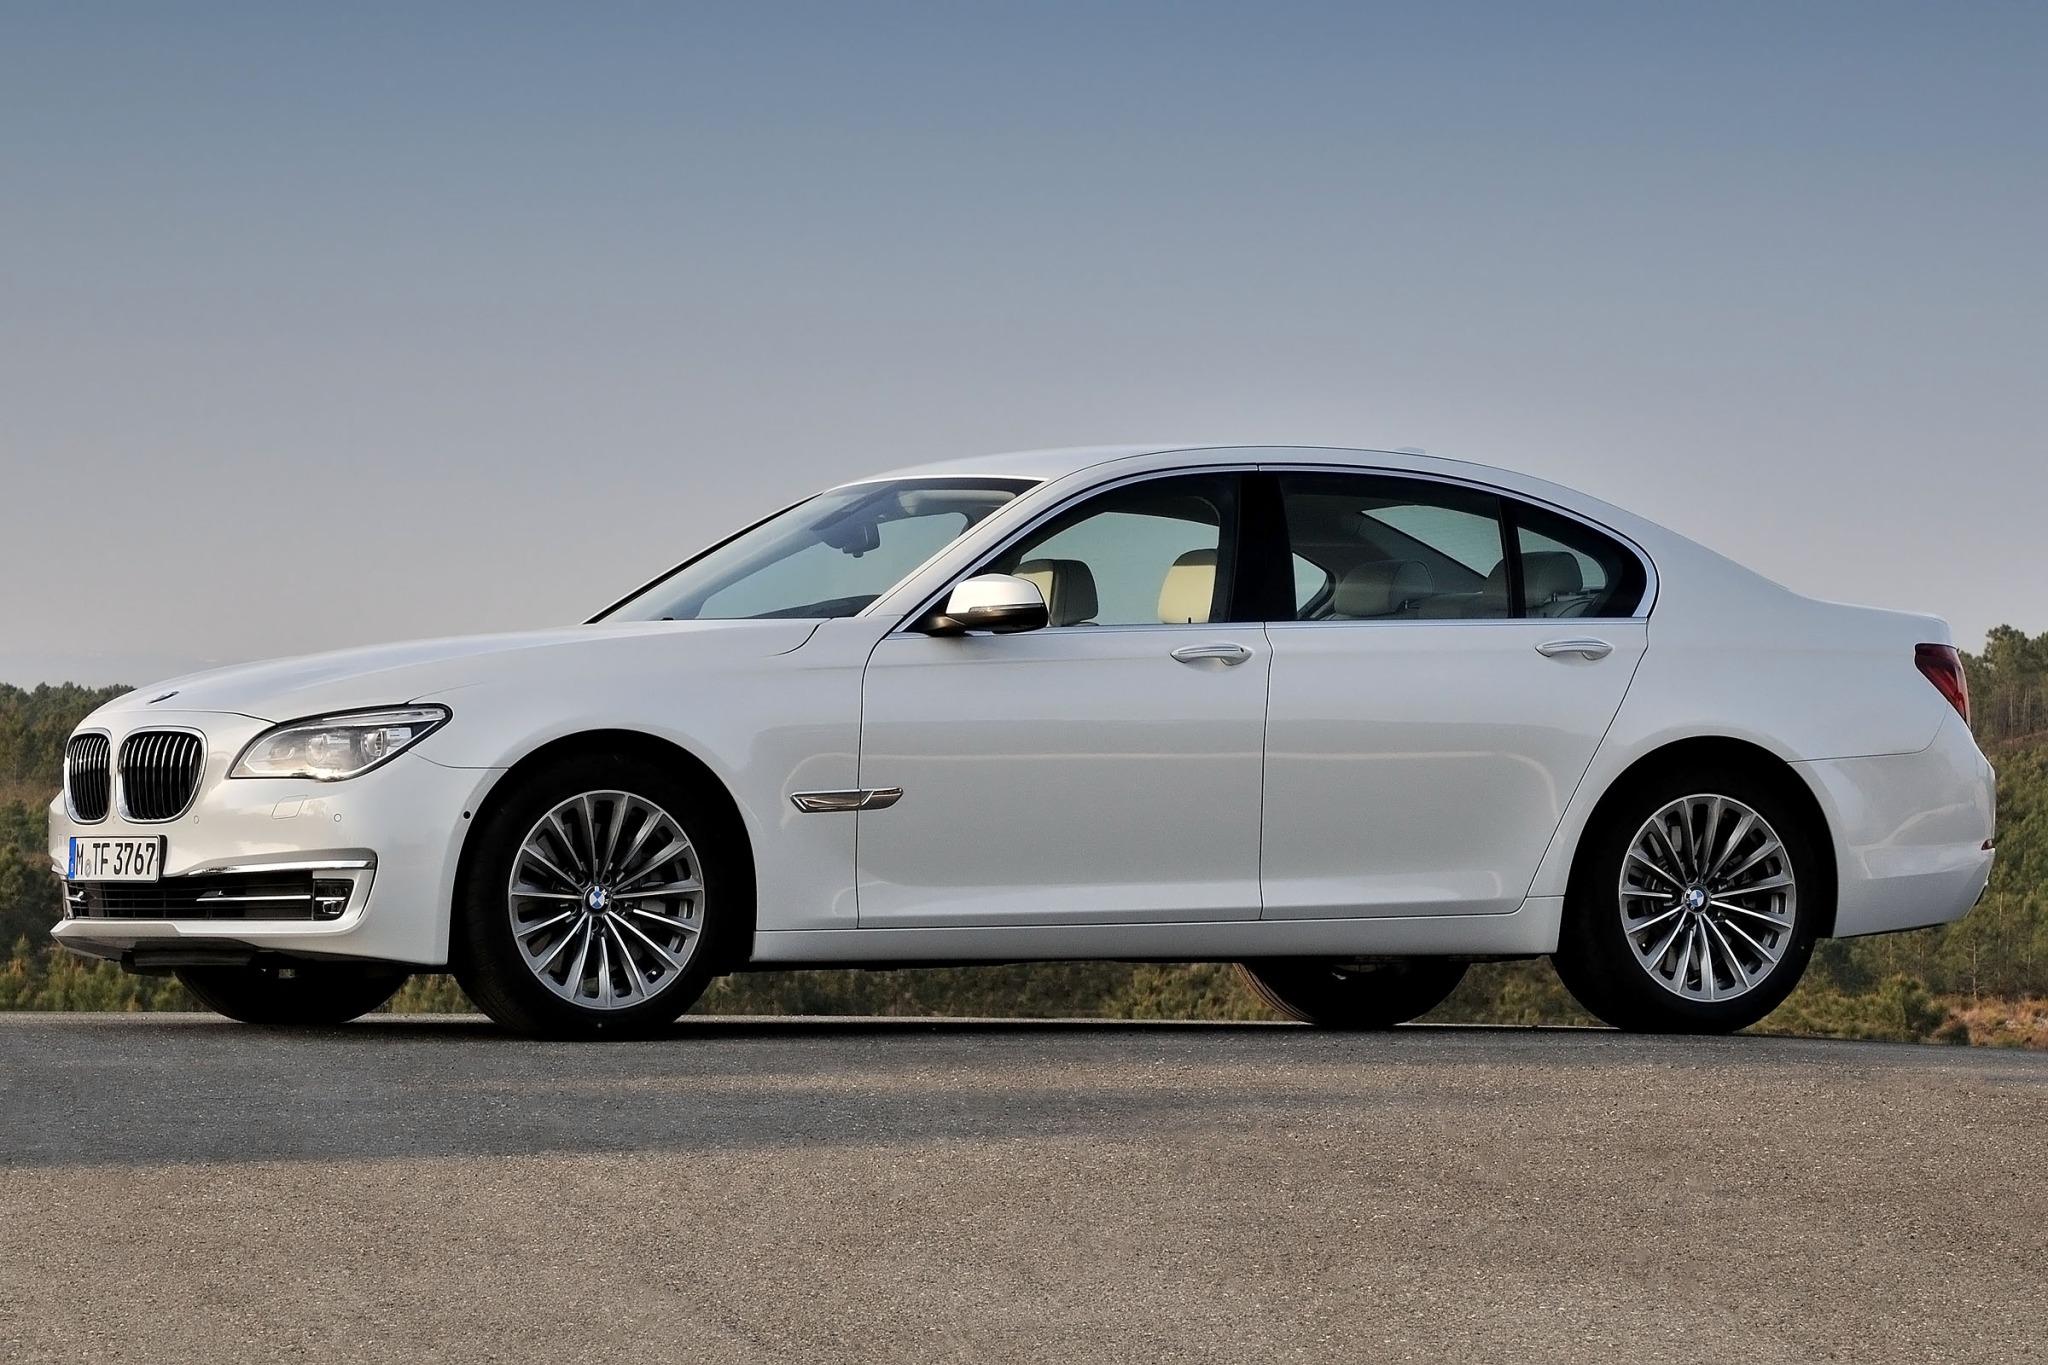 2014 BMW 7 Series Sedan Exterior 8